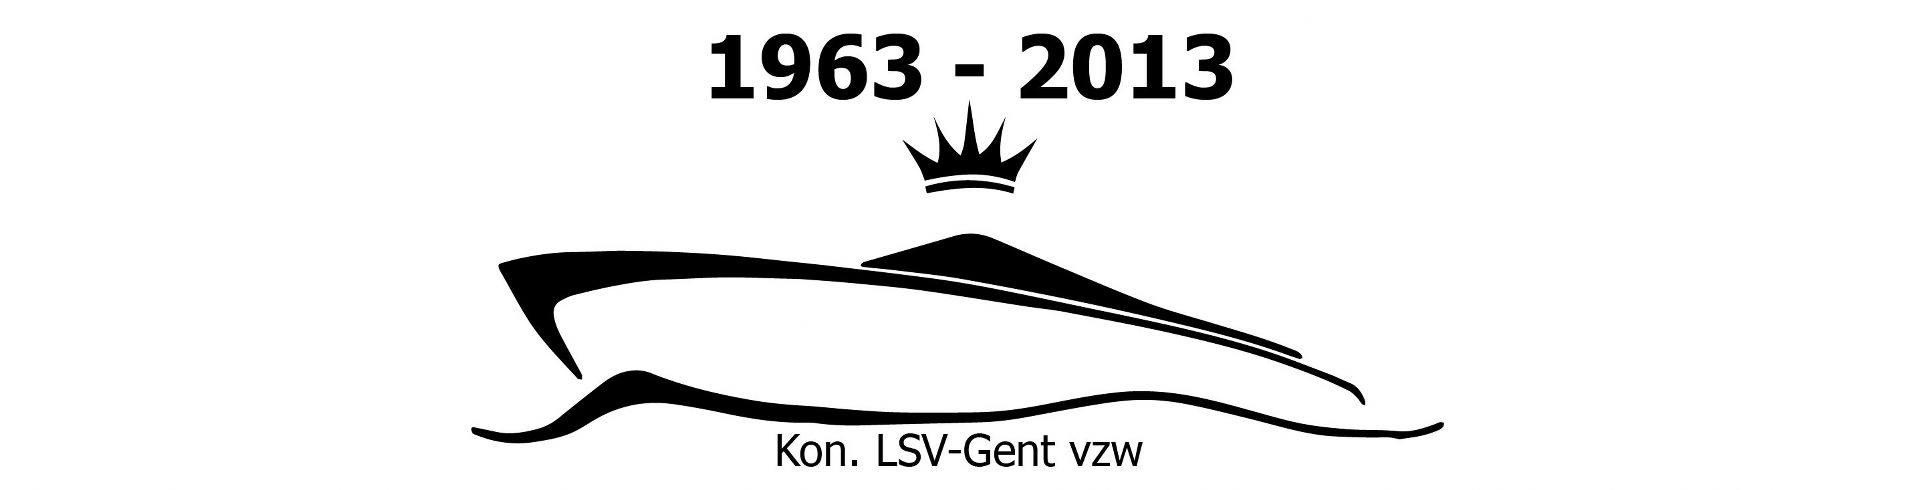 Logo Koninklijke LSV Gent vzw